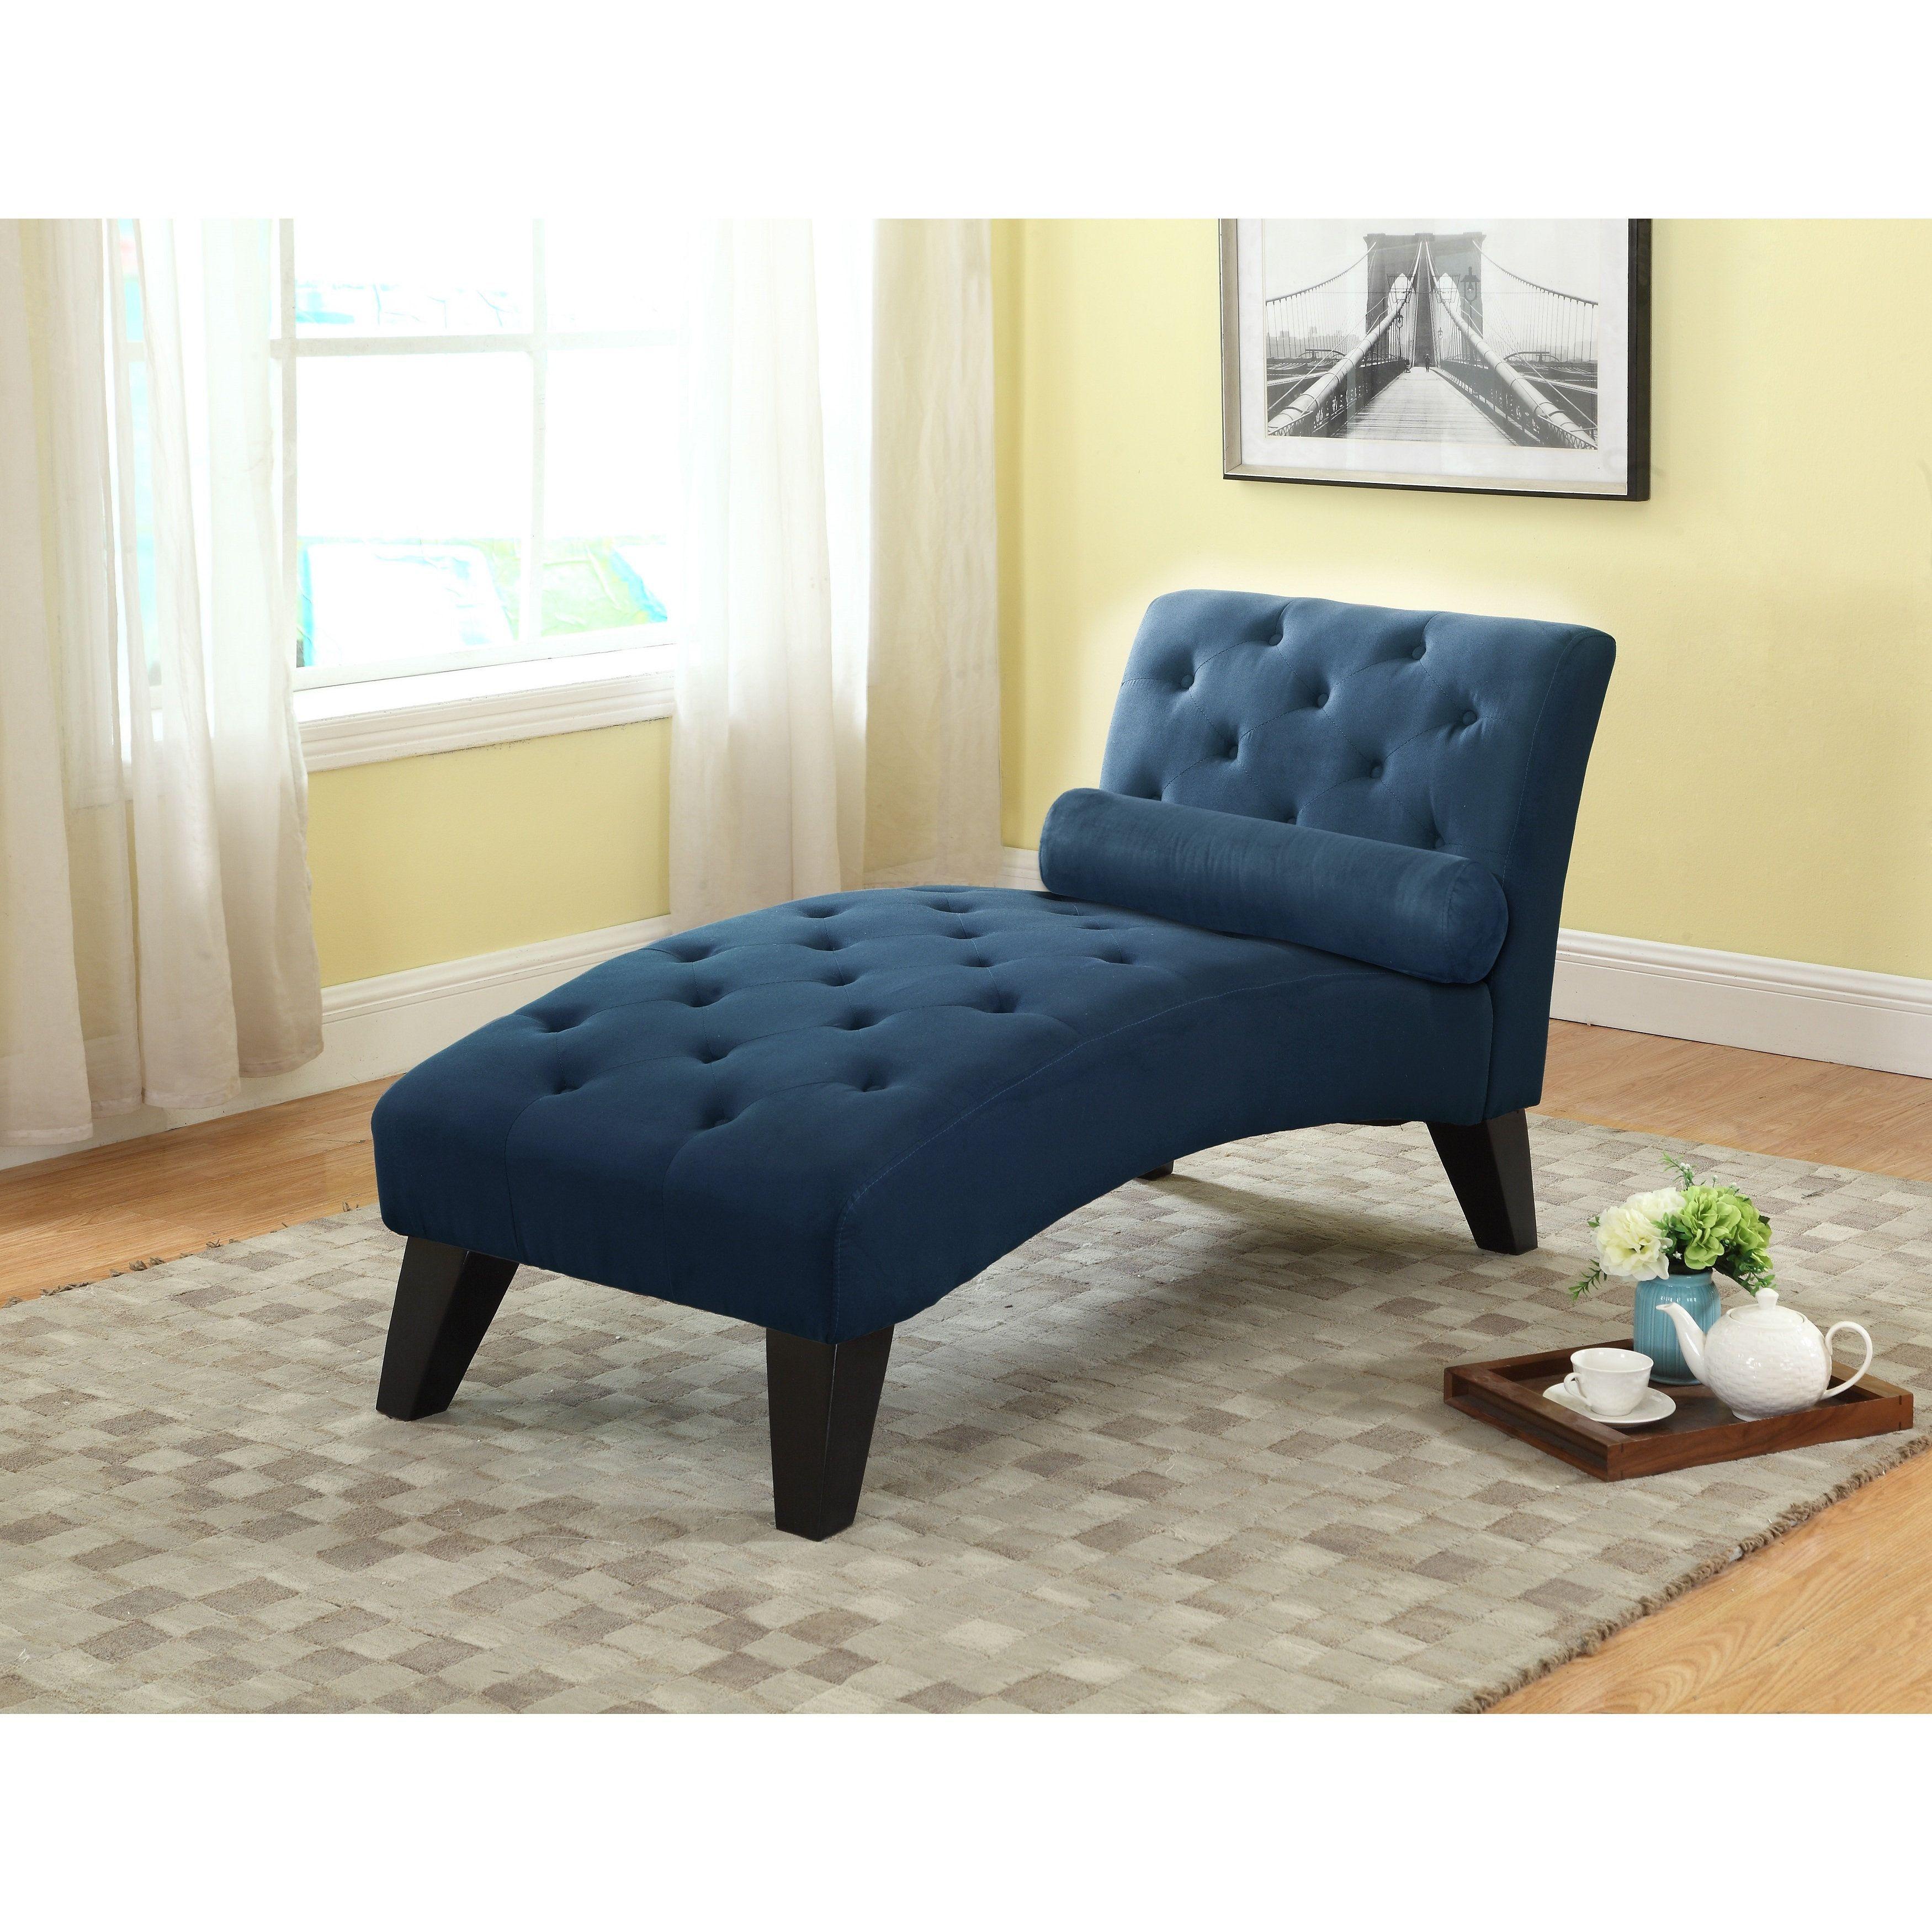 Nathaniel home mila tufted blue microfiber chaise lounge mila blue